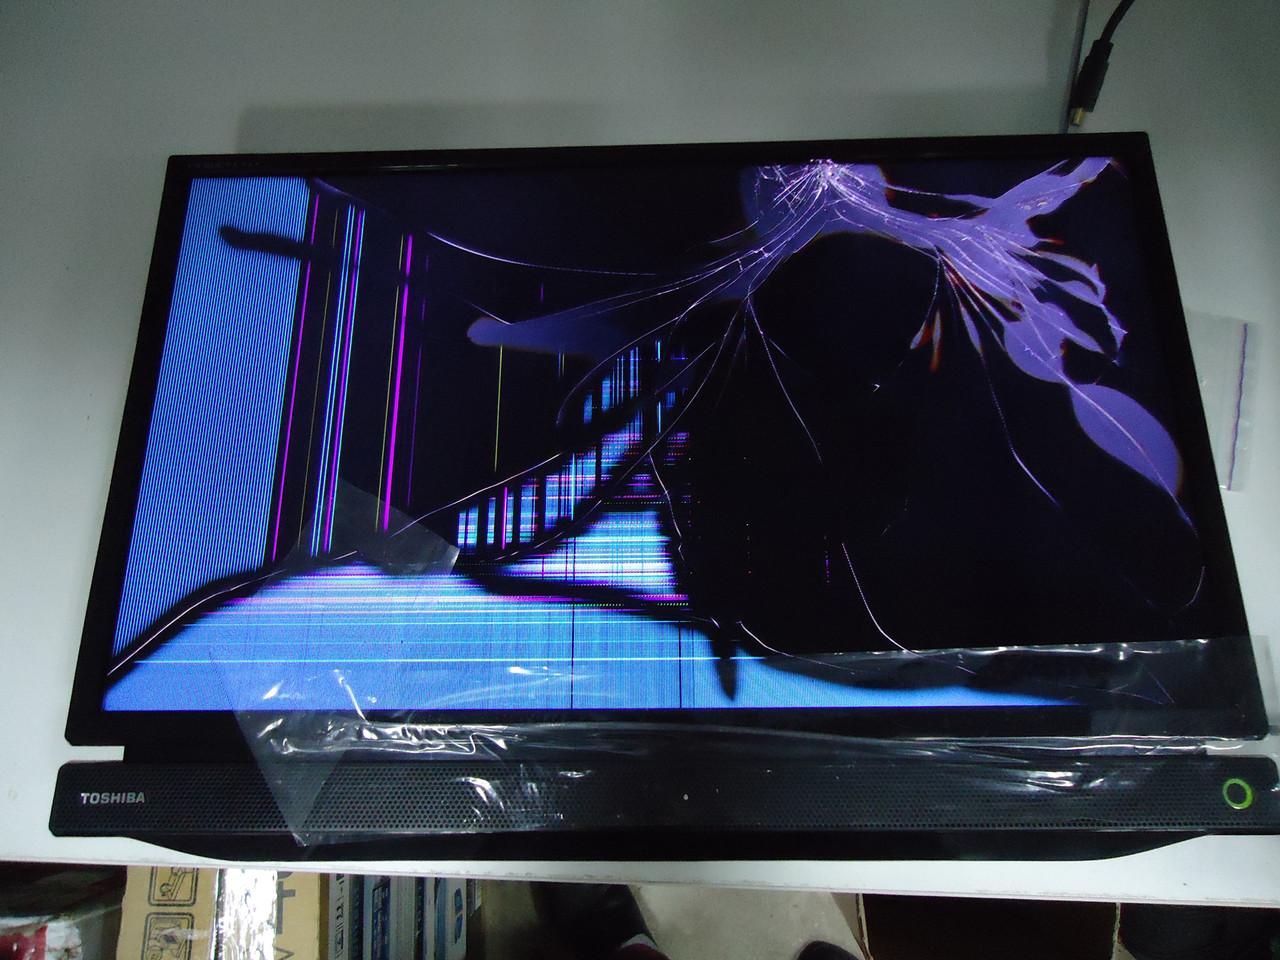 "Телевизор 24"" Toshiba 24P1306EV на запчасти разбита матрица (TL240XS2A-0, V71A00028801 )"